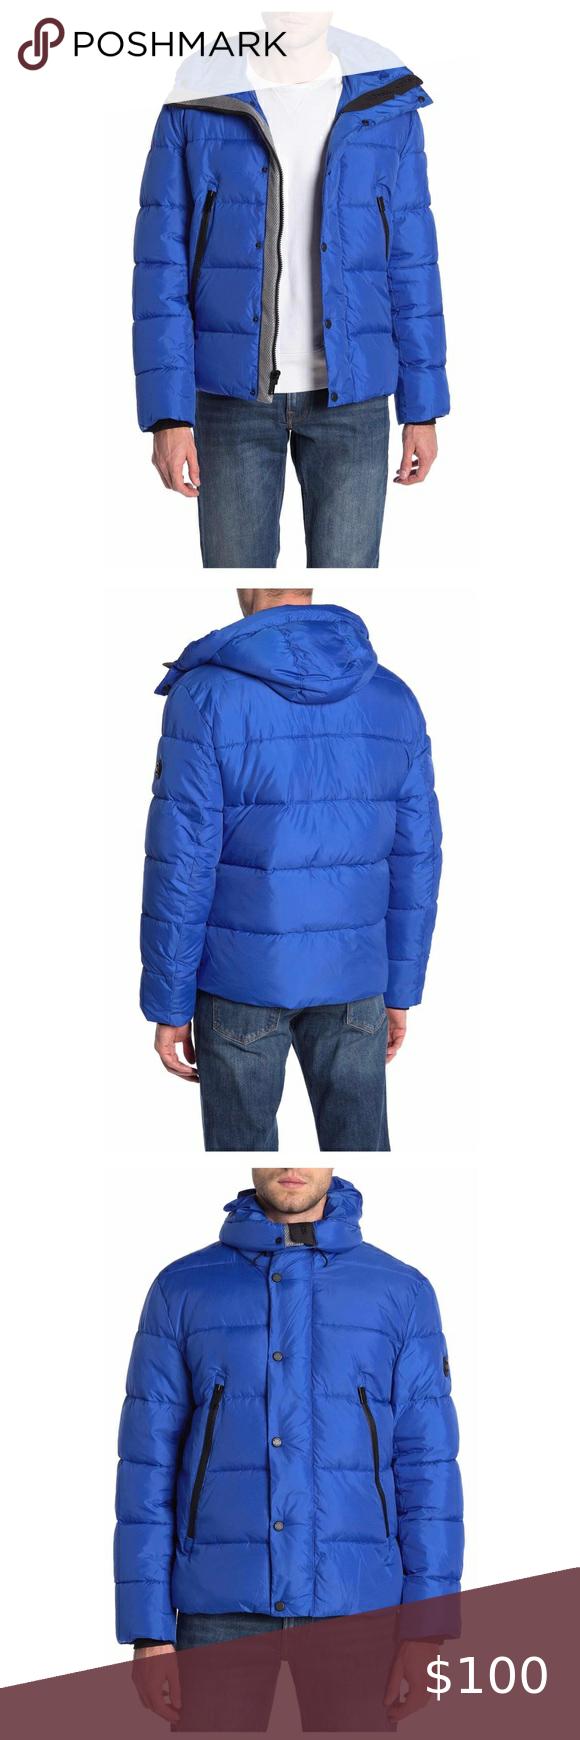 Michael Kors Men S Water Resistant Jacket Winter Fashion Coats Clothes Design Black Quilted Jacket [ 1740 x 580 Pixel ]